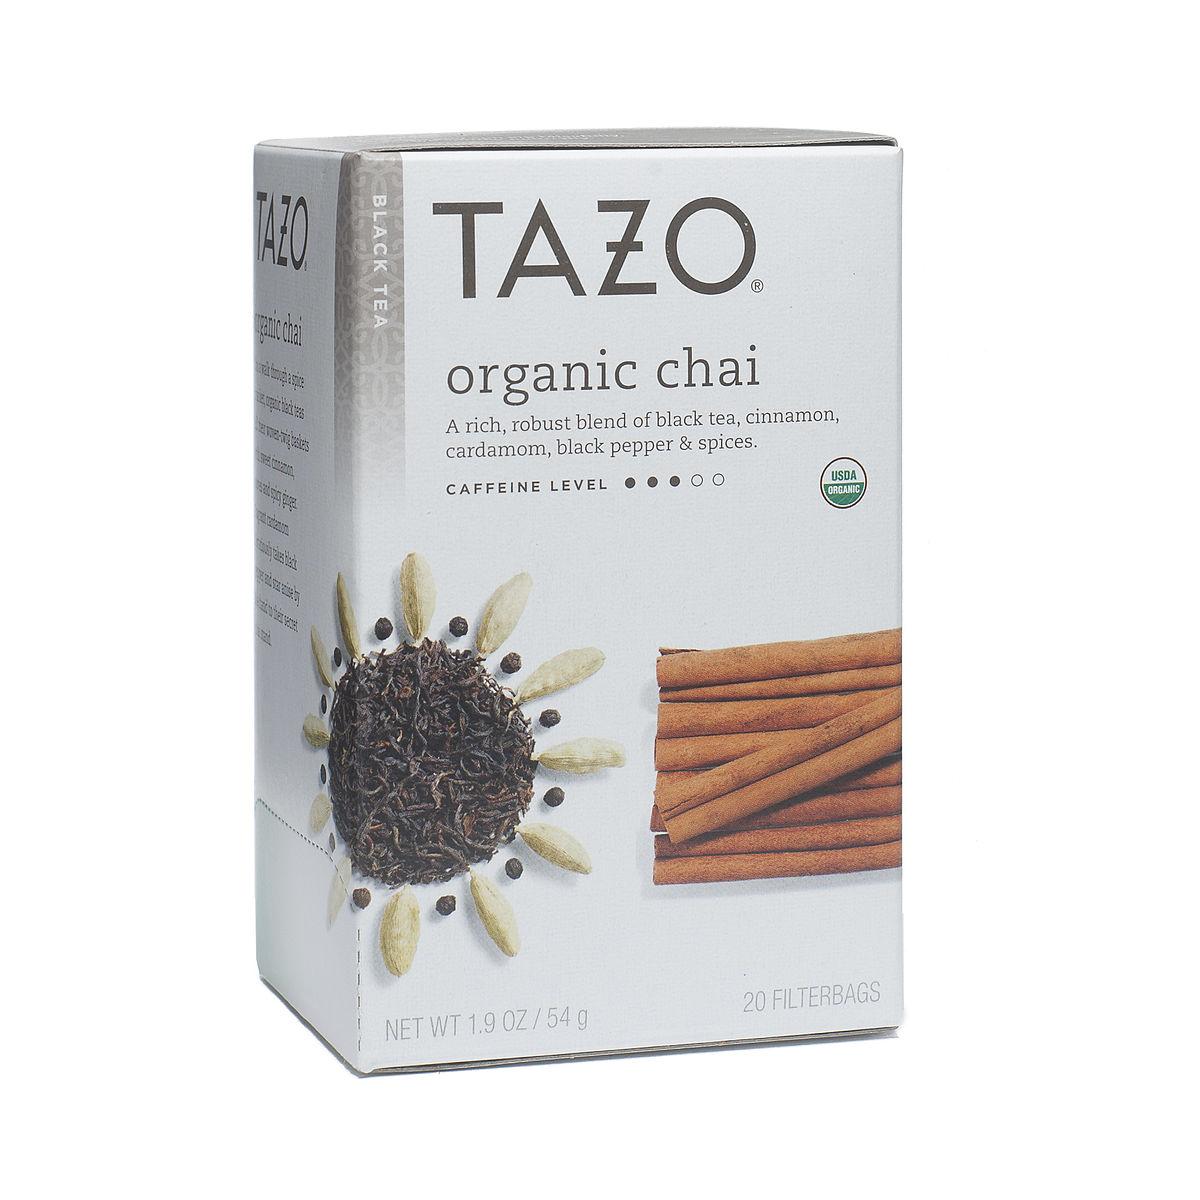 Tazo chai tea ingredients